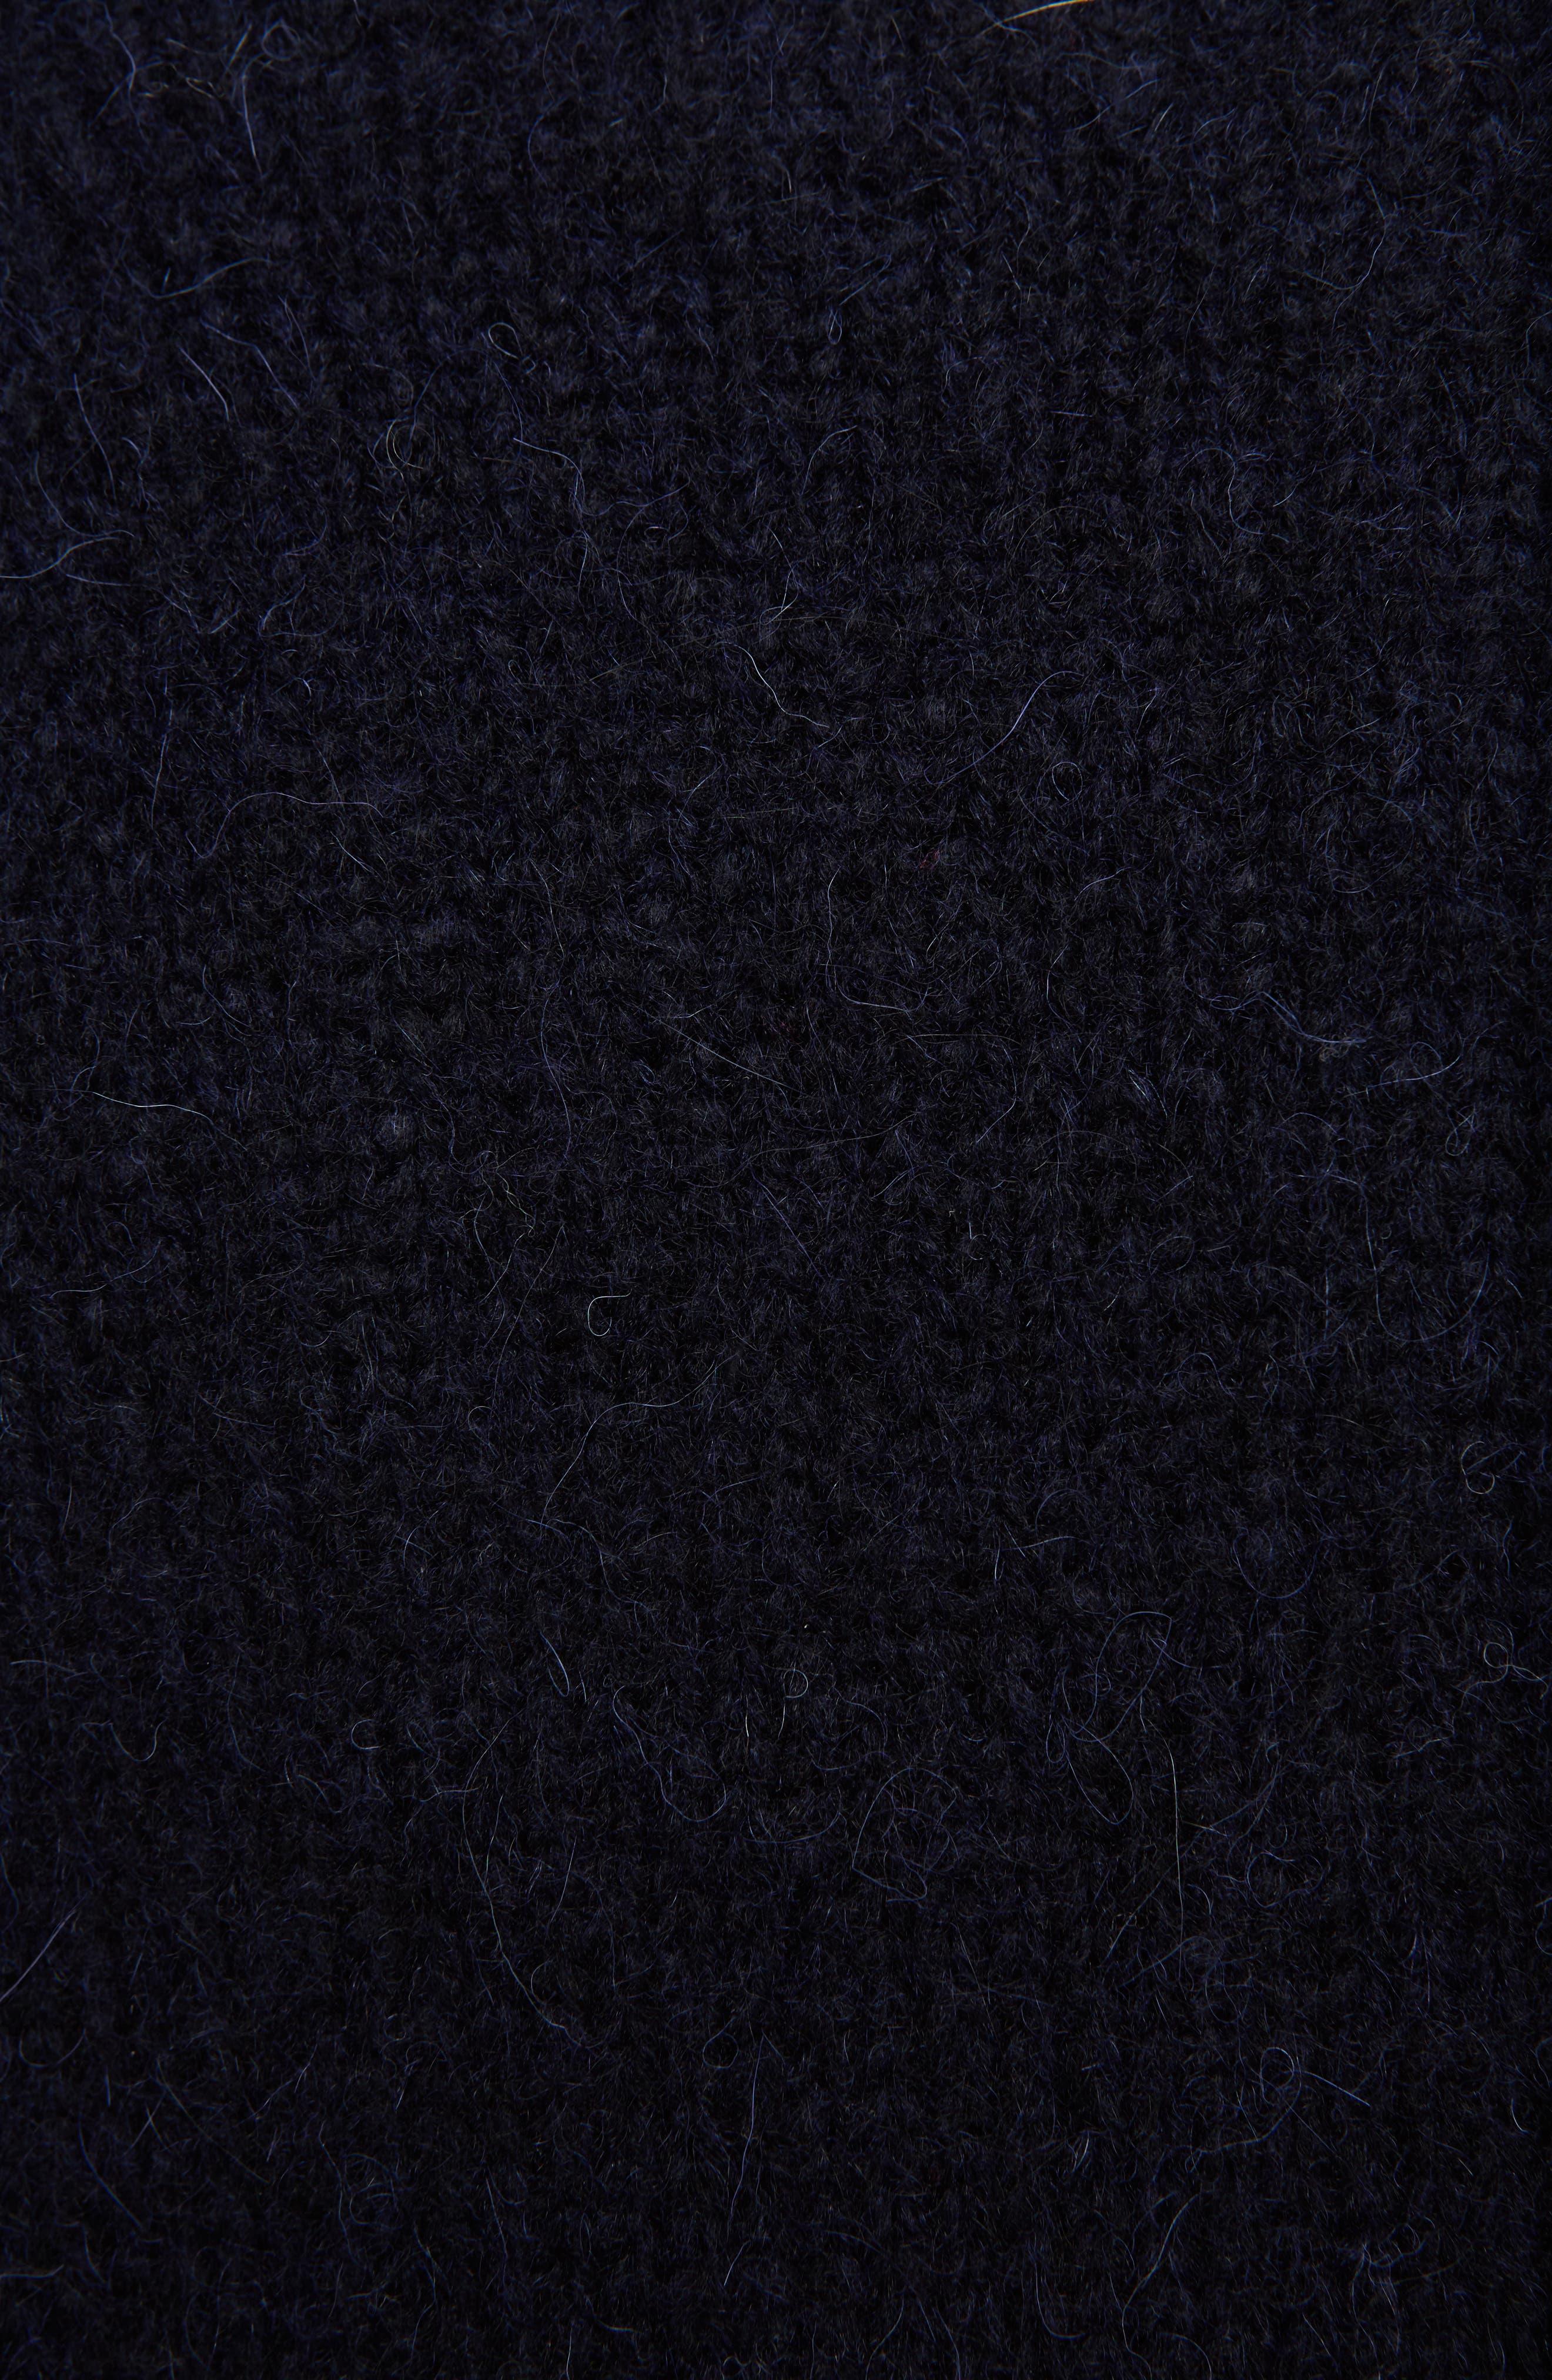 Karel Oversize Merino Sweater,                             Alternate thumbnail 5, color,                             Black